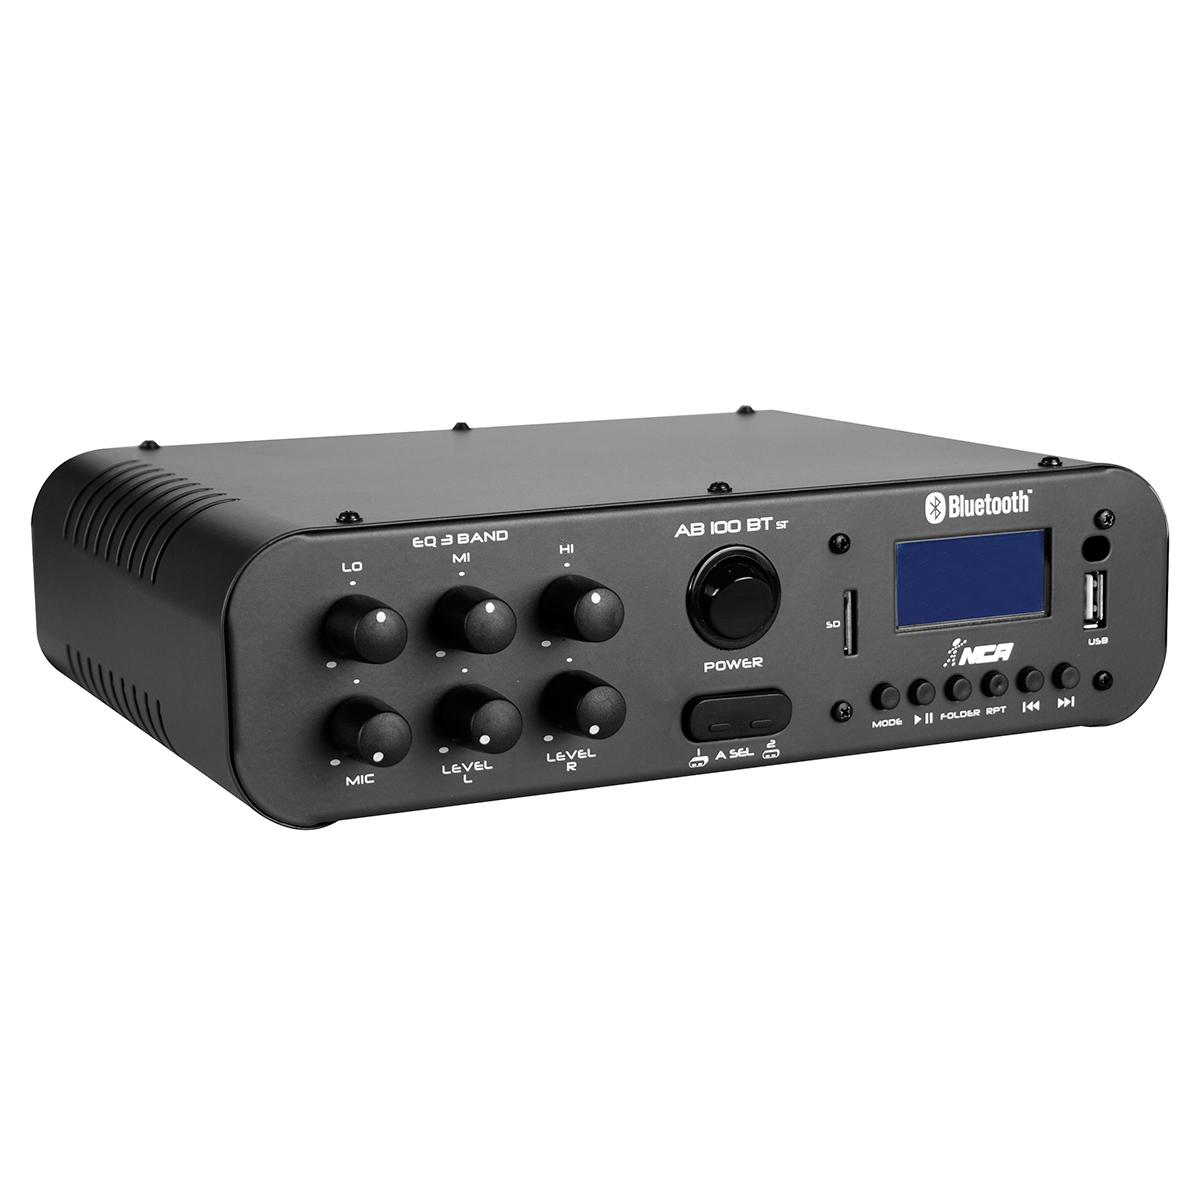 AB100STBT - Amplificador Som Ambiente Estéreo 100W c/ Bluetooth AB 100 ST BT - NCA